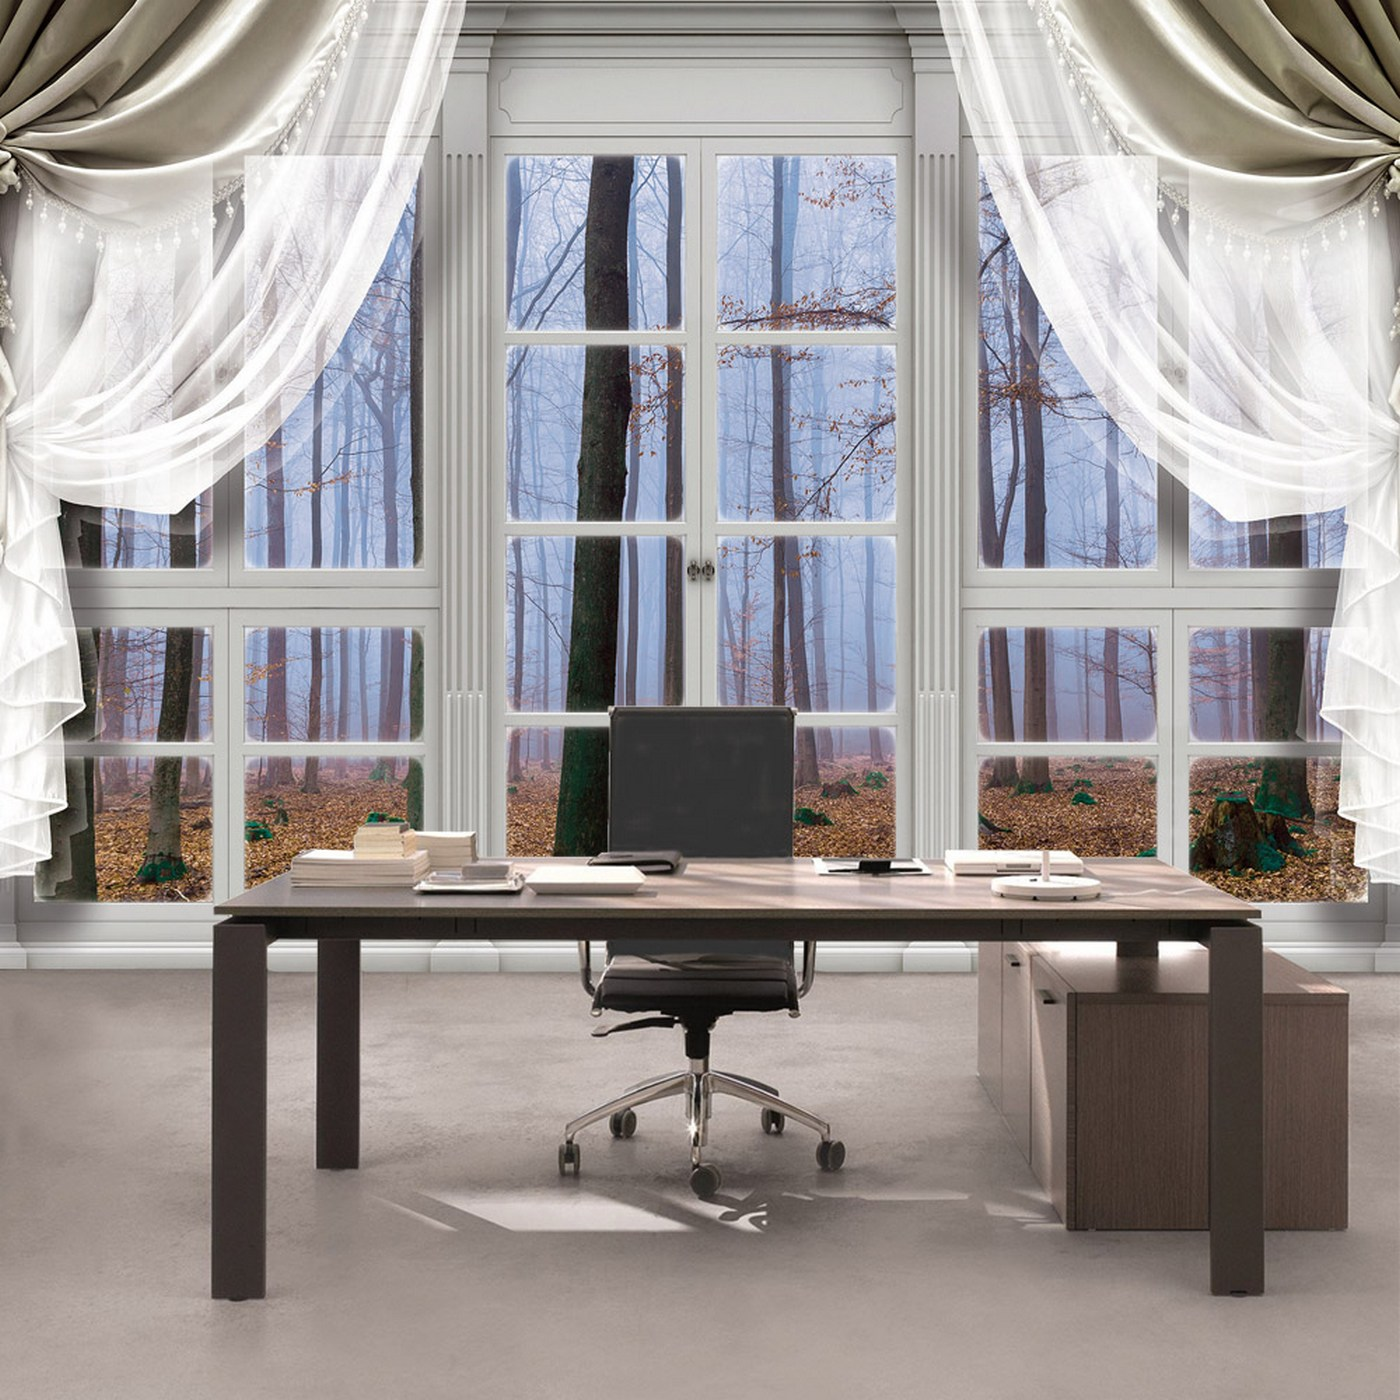 kiss fototapeten zu besten preisen fototapete no. Black Bedroom Furniture Sets. Home Design Ideas